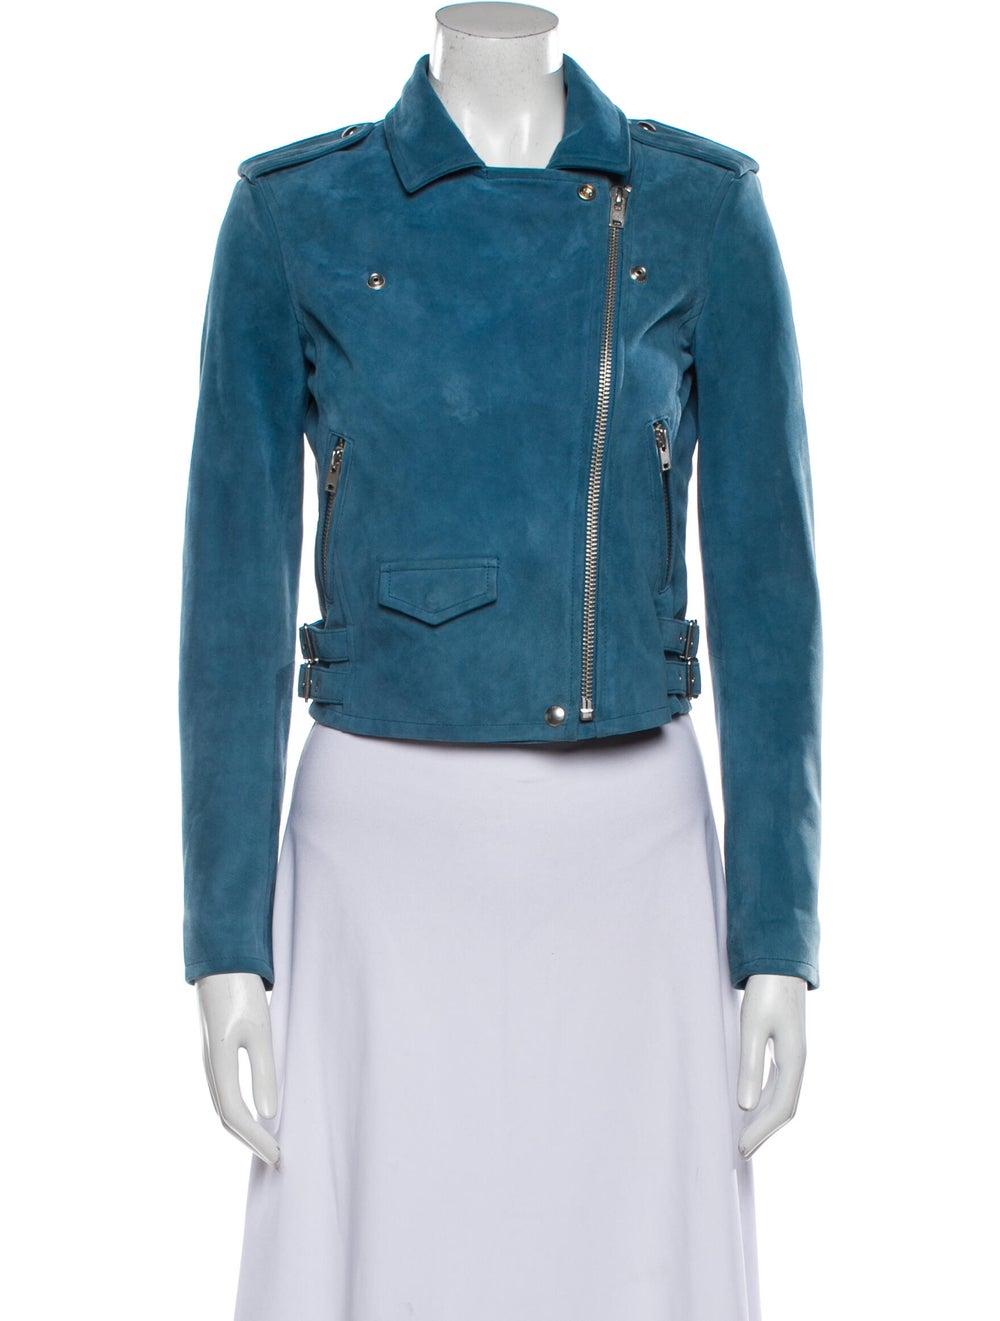 Iro Biker Jacket Blue - image 4